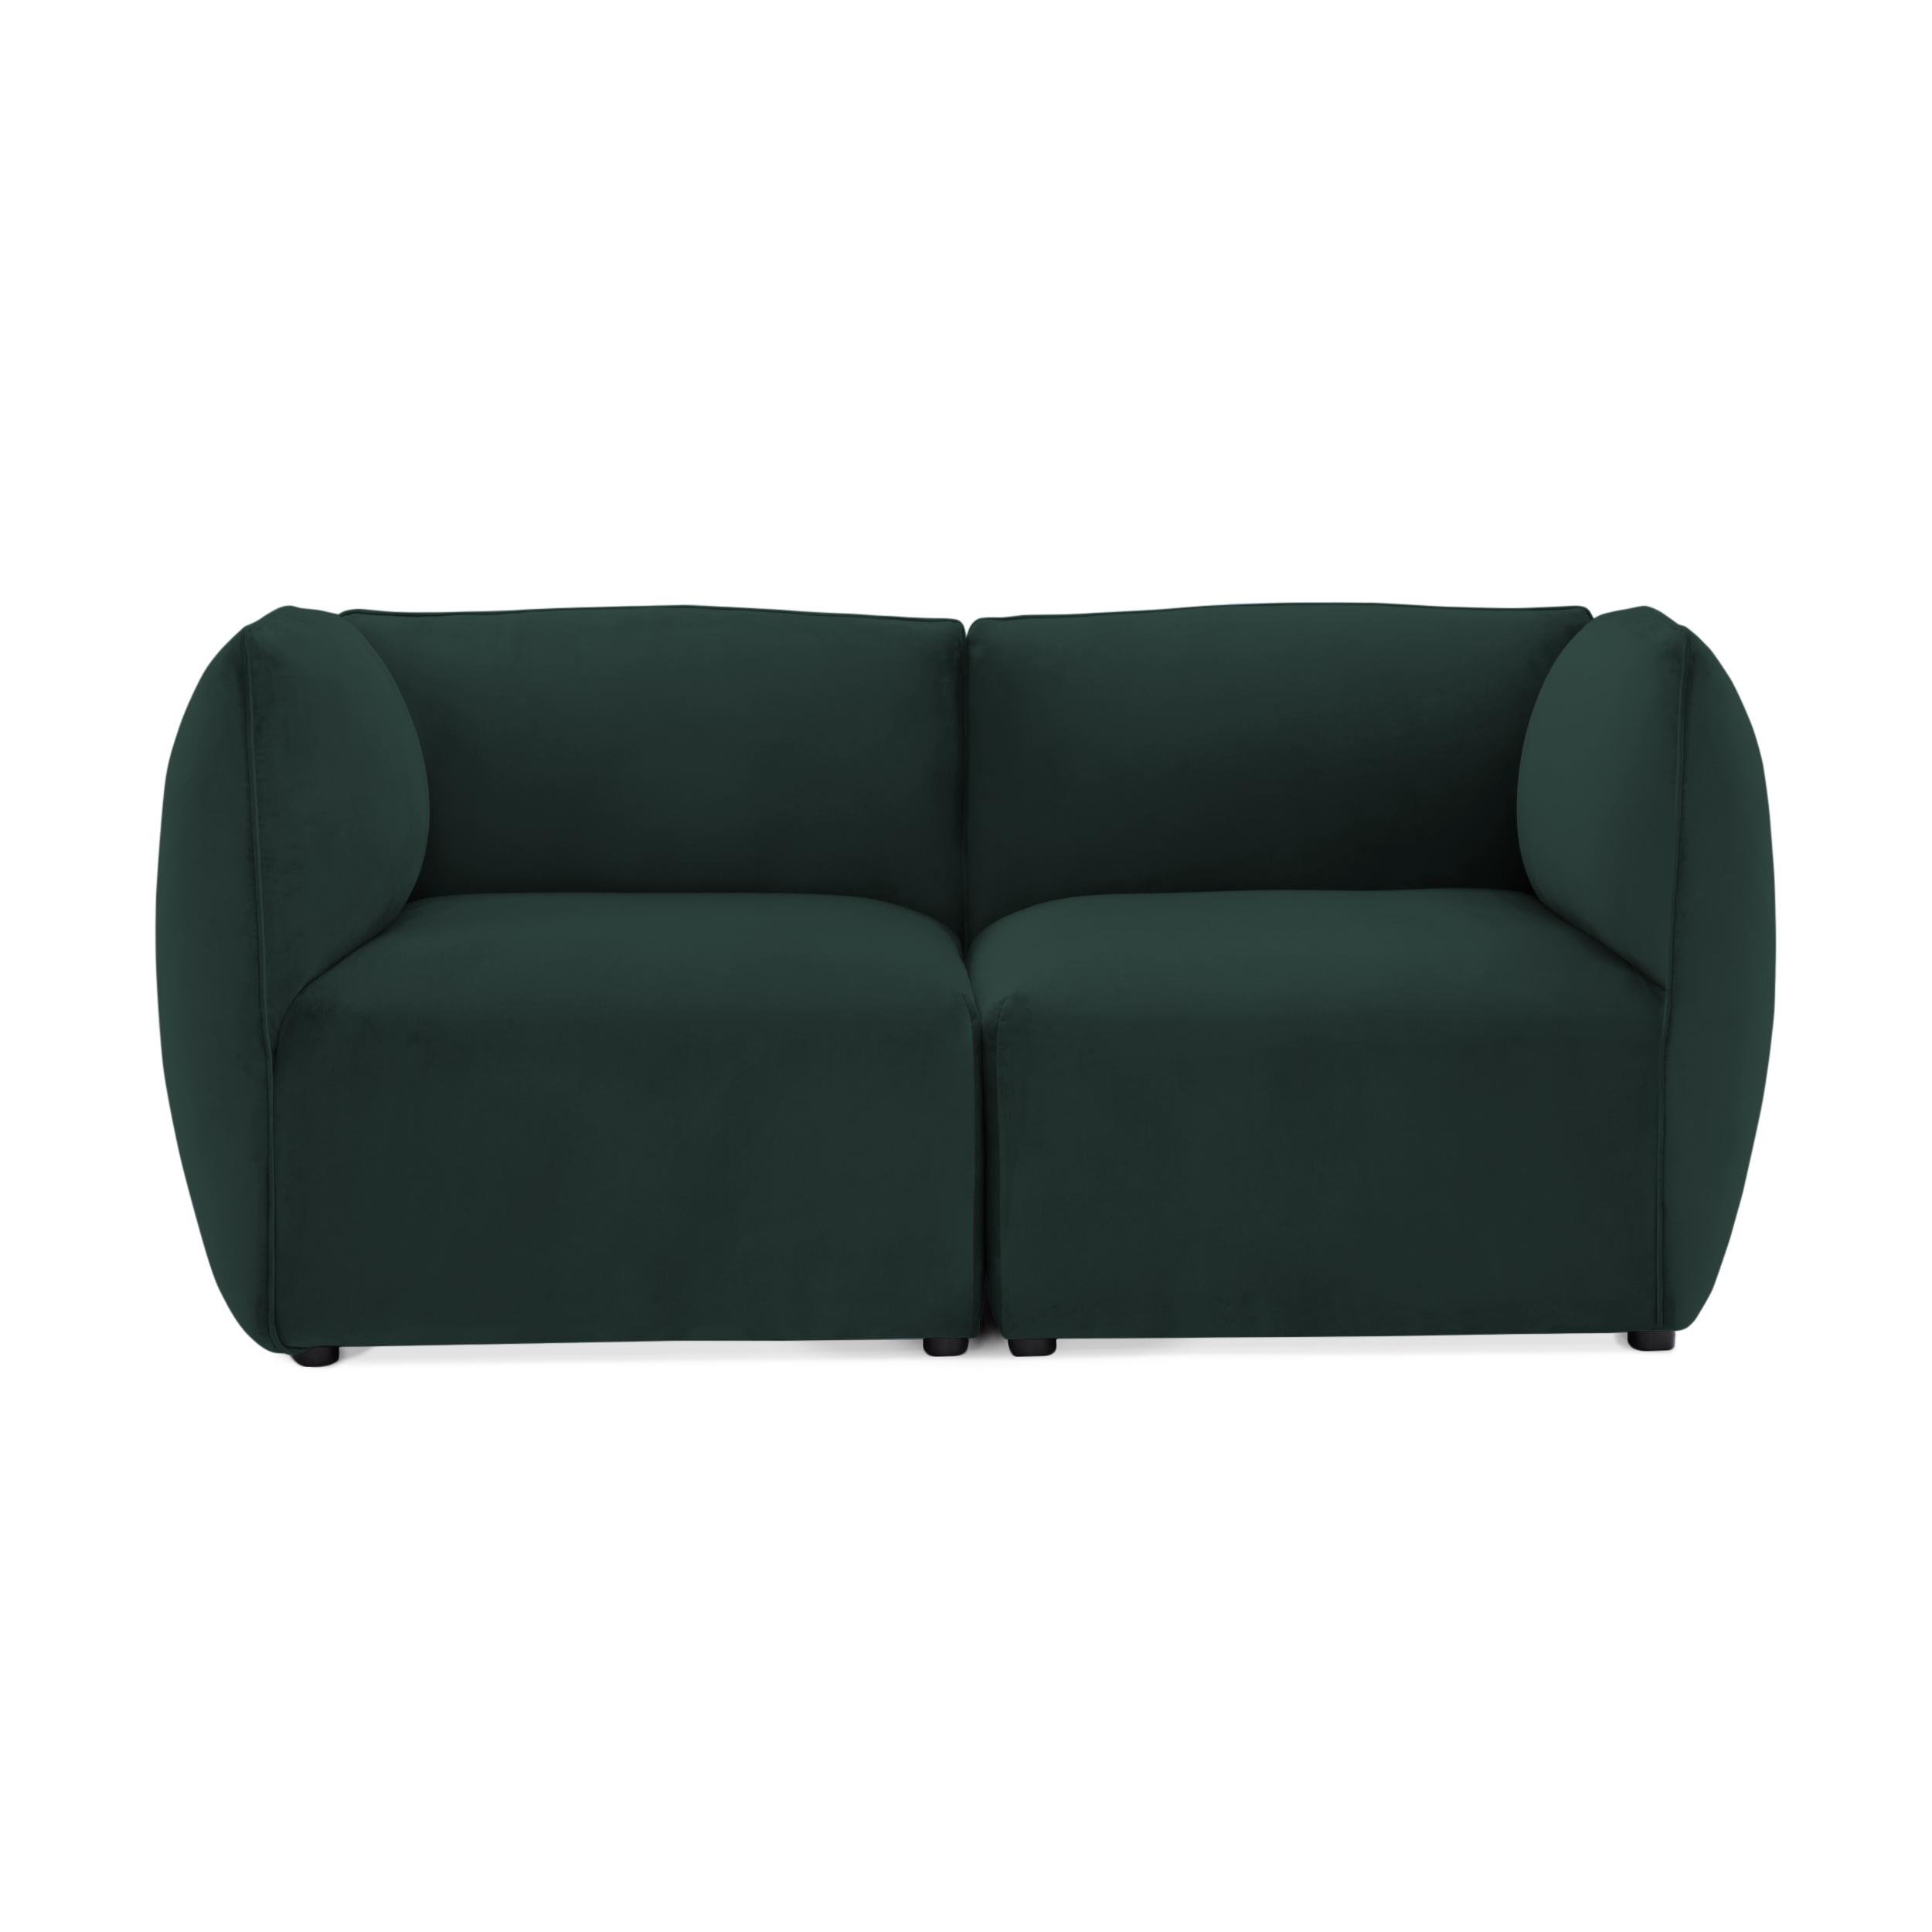 Canapea 2 locuri Cube Petrol Green